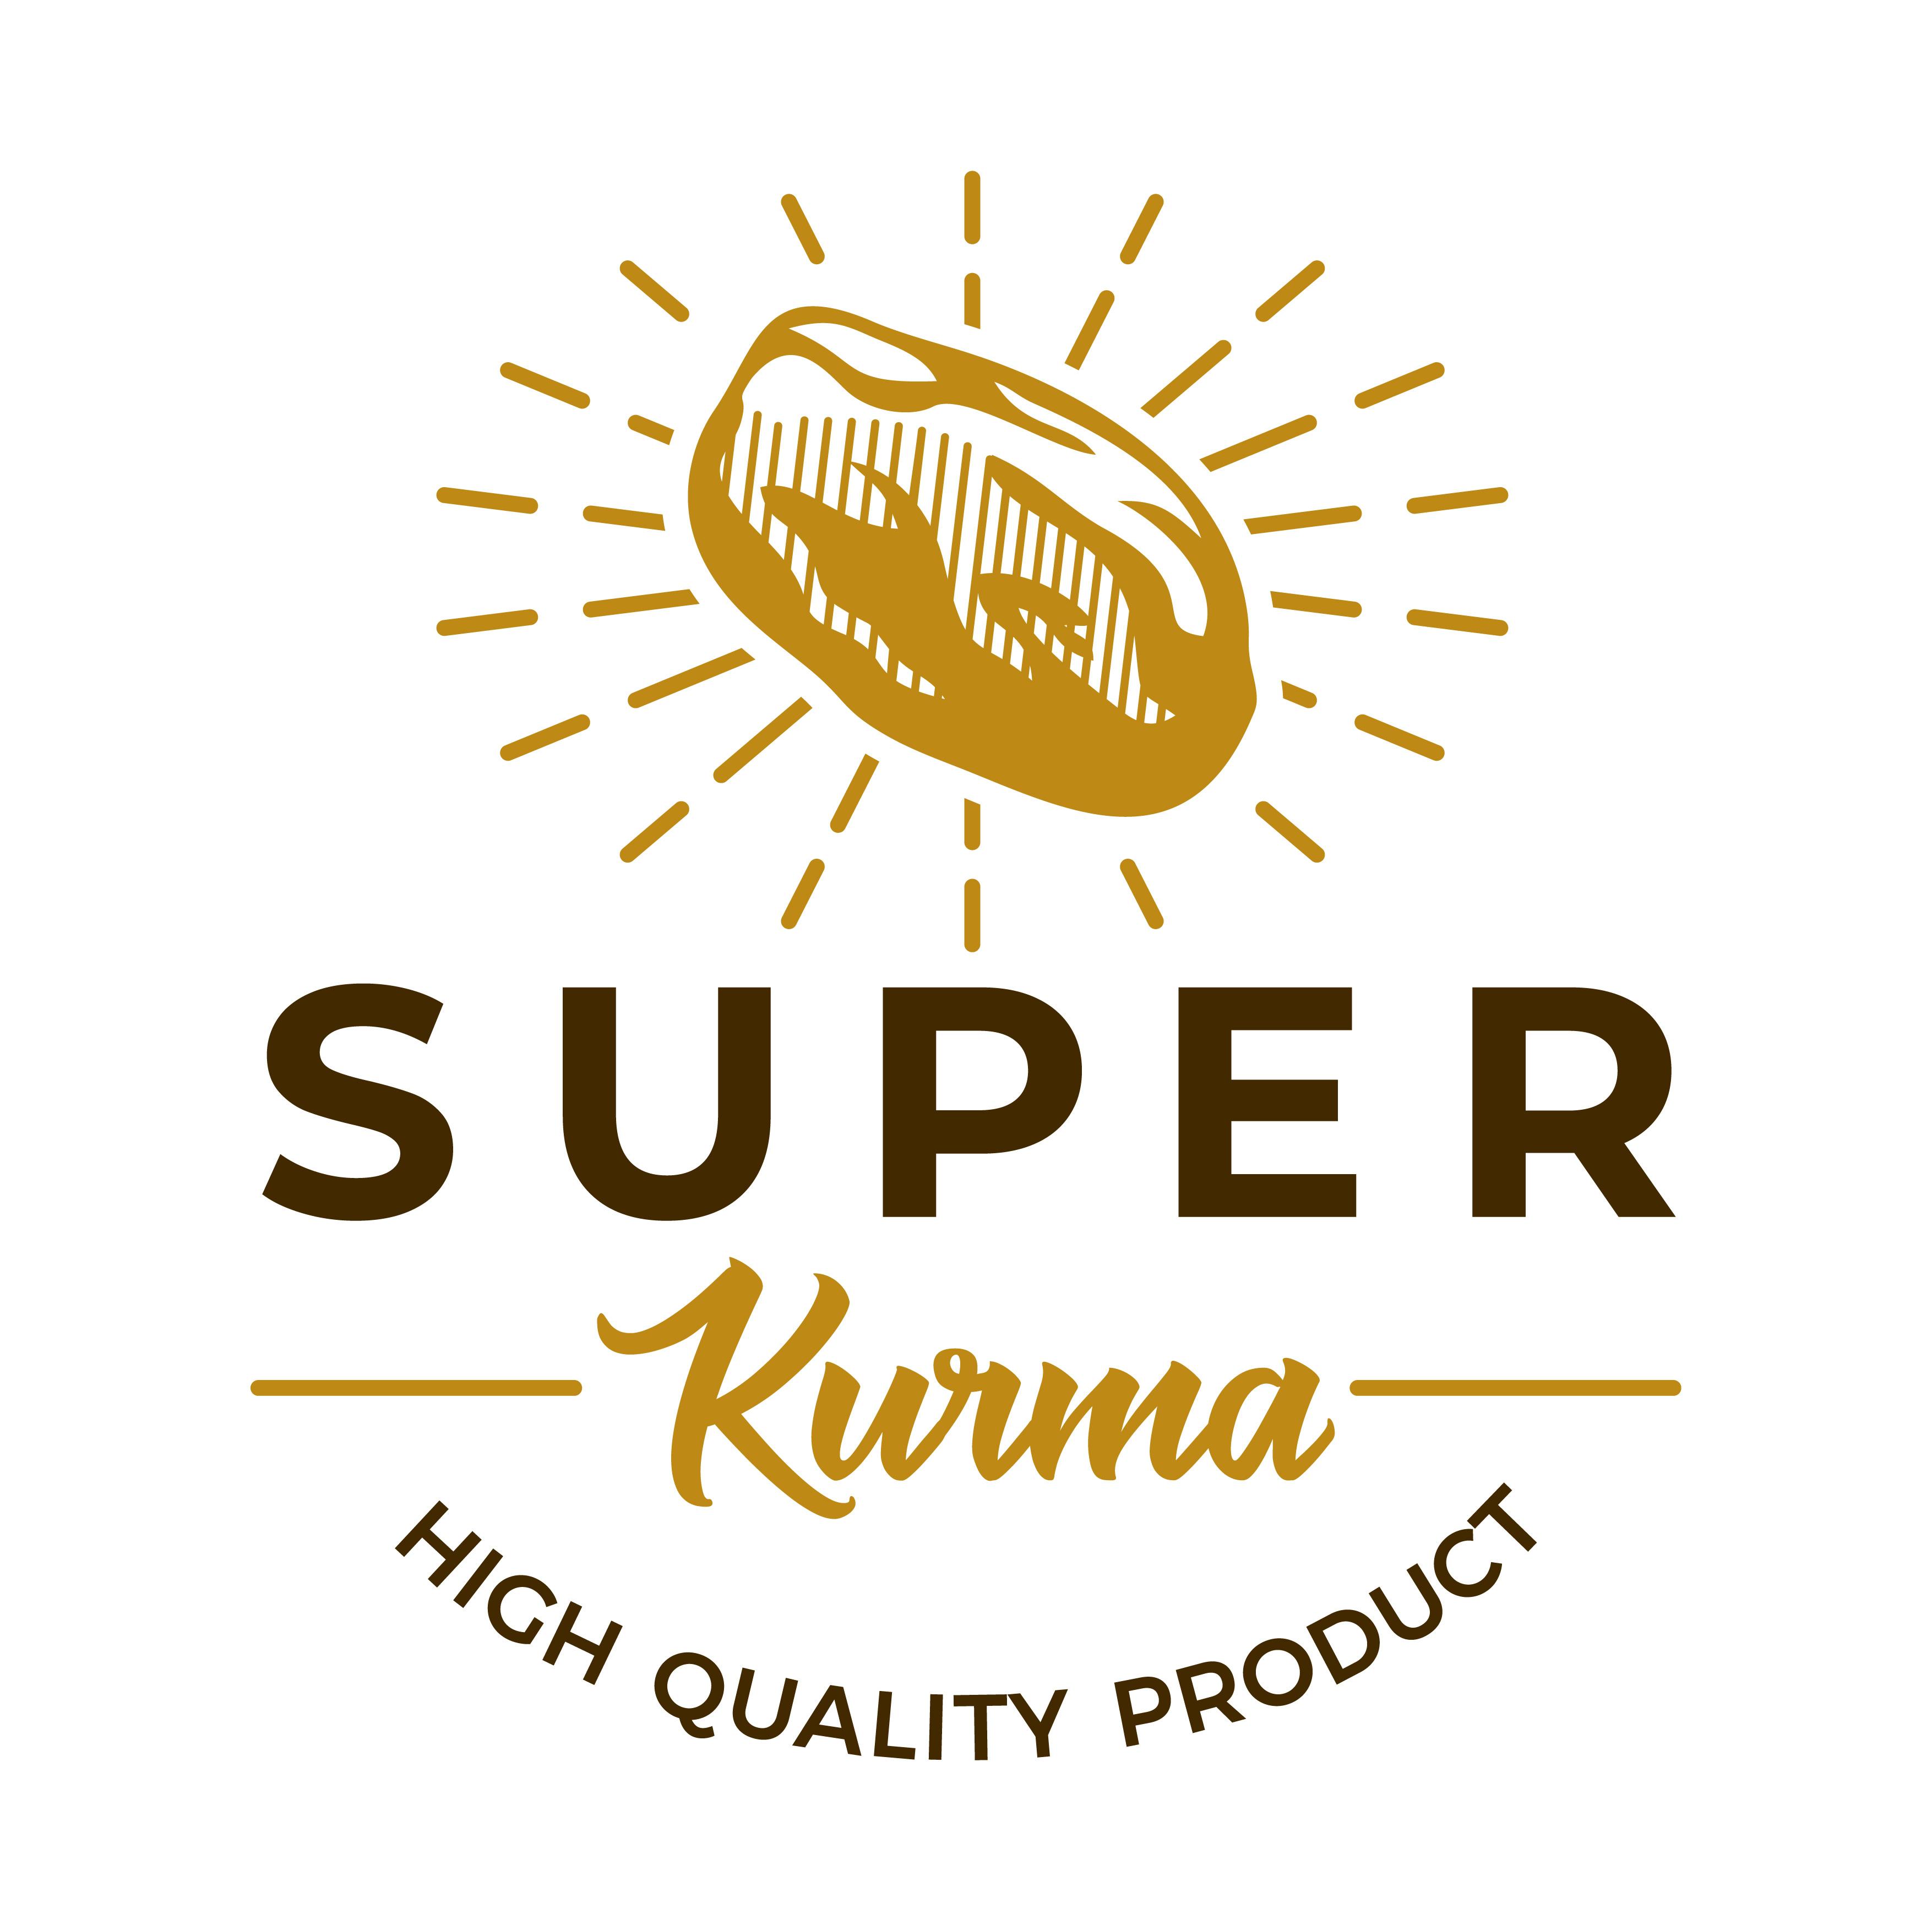 Superkurma logo